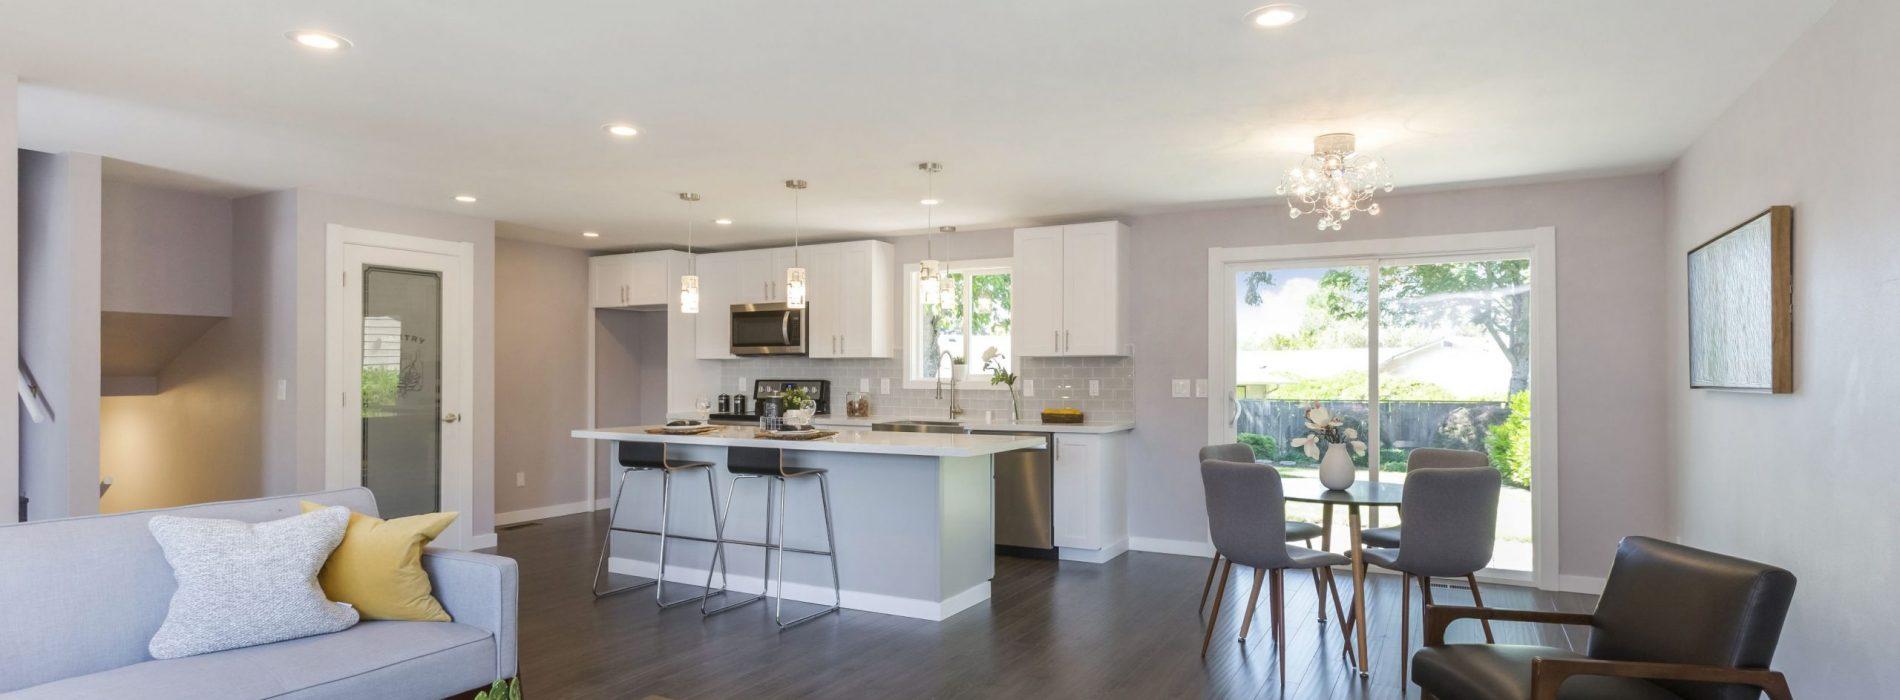 Home Remodeling Contractors San Jose